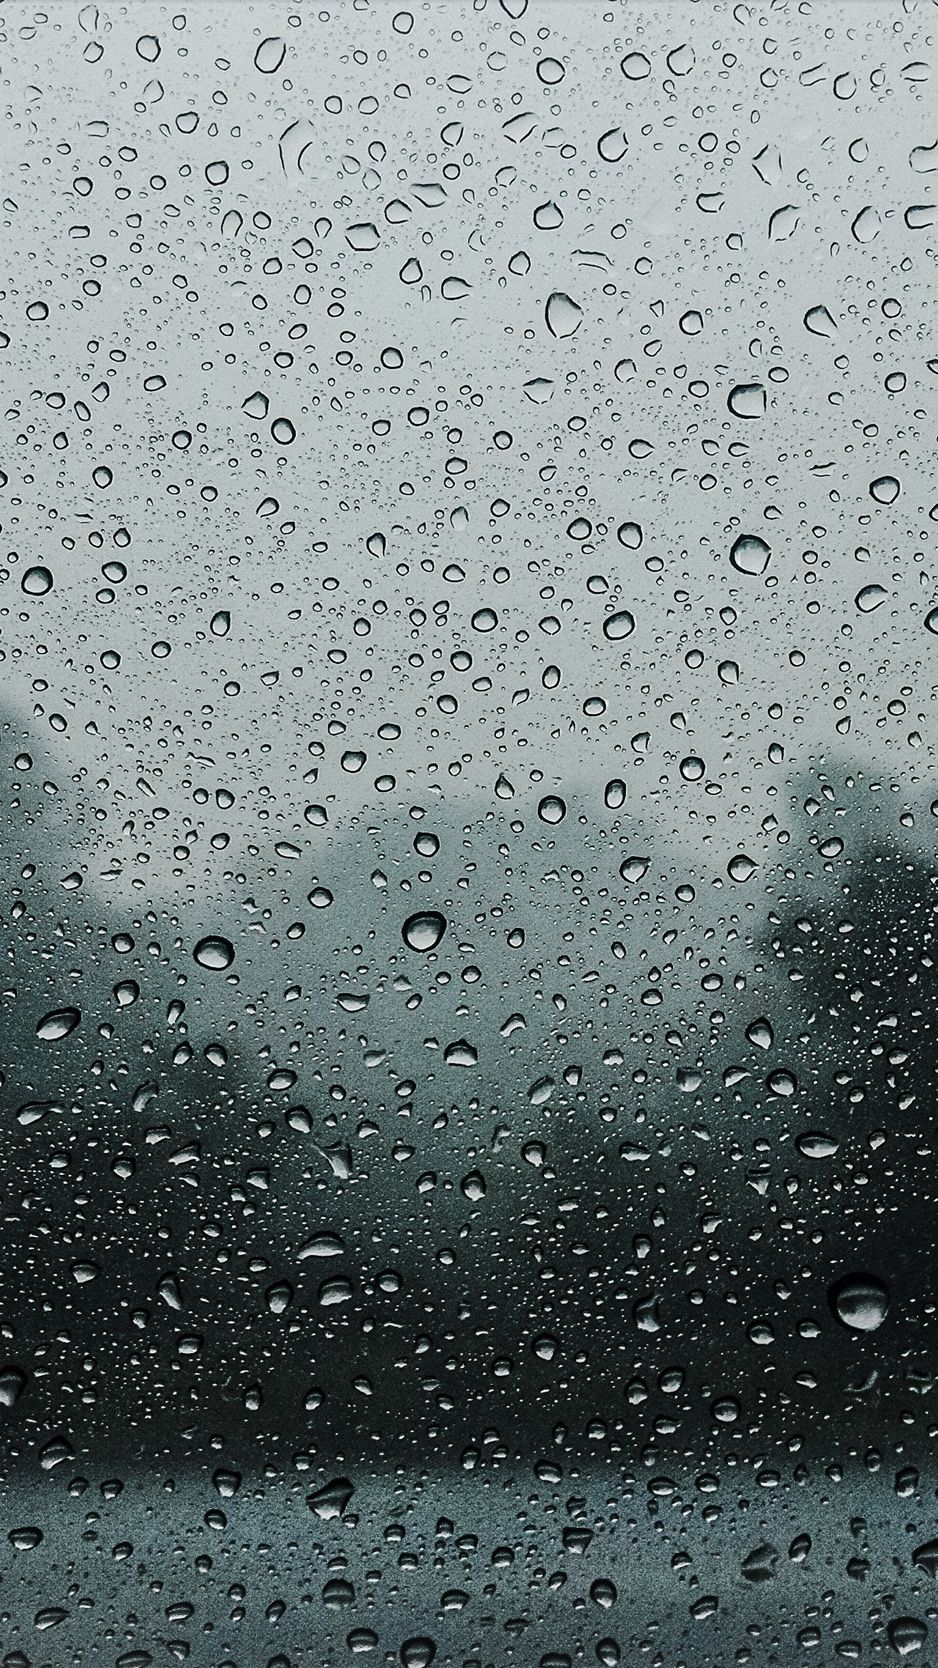 Rain On Glass Wallpapers Top Free Rain On Glass